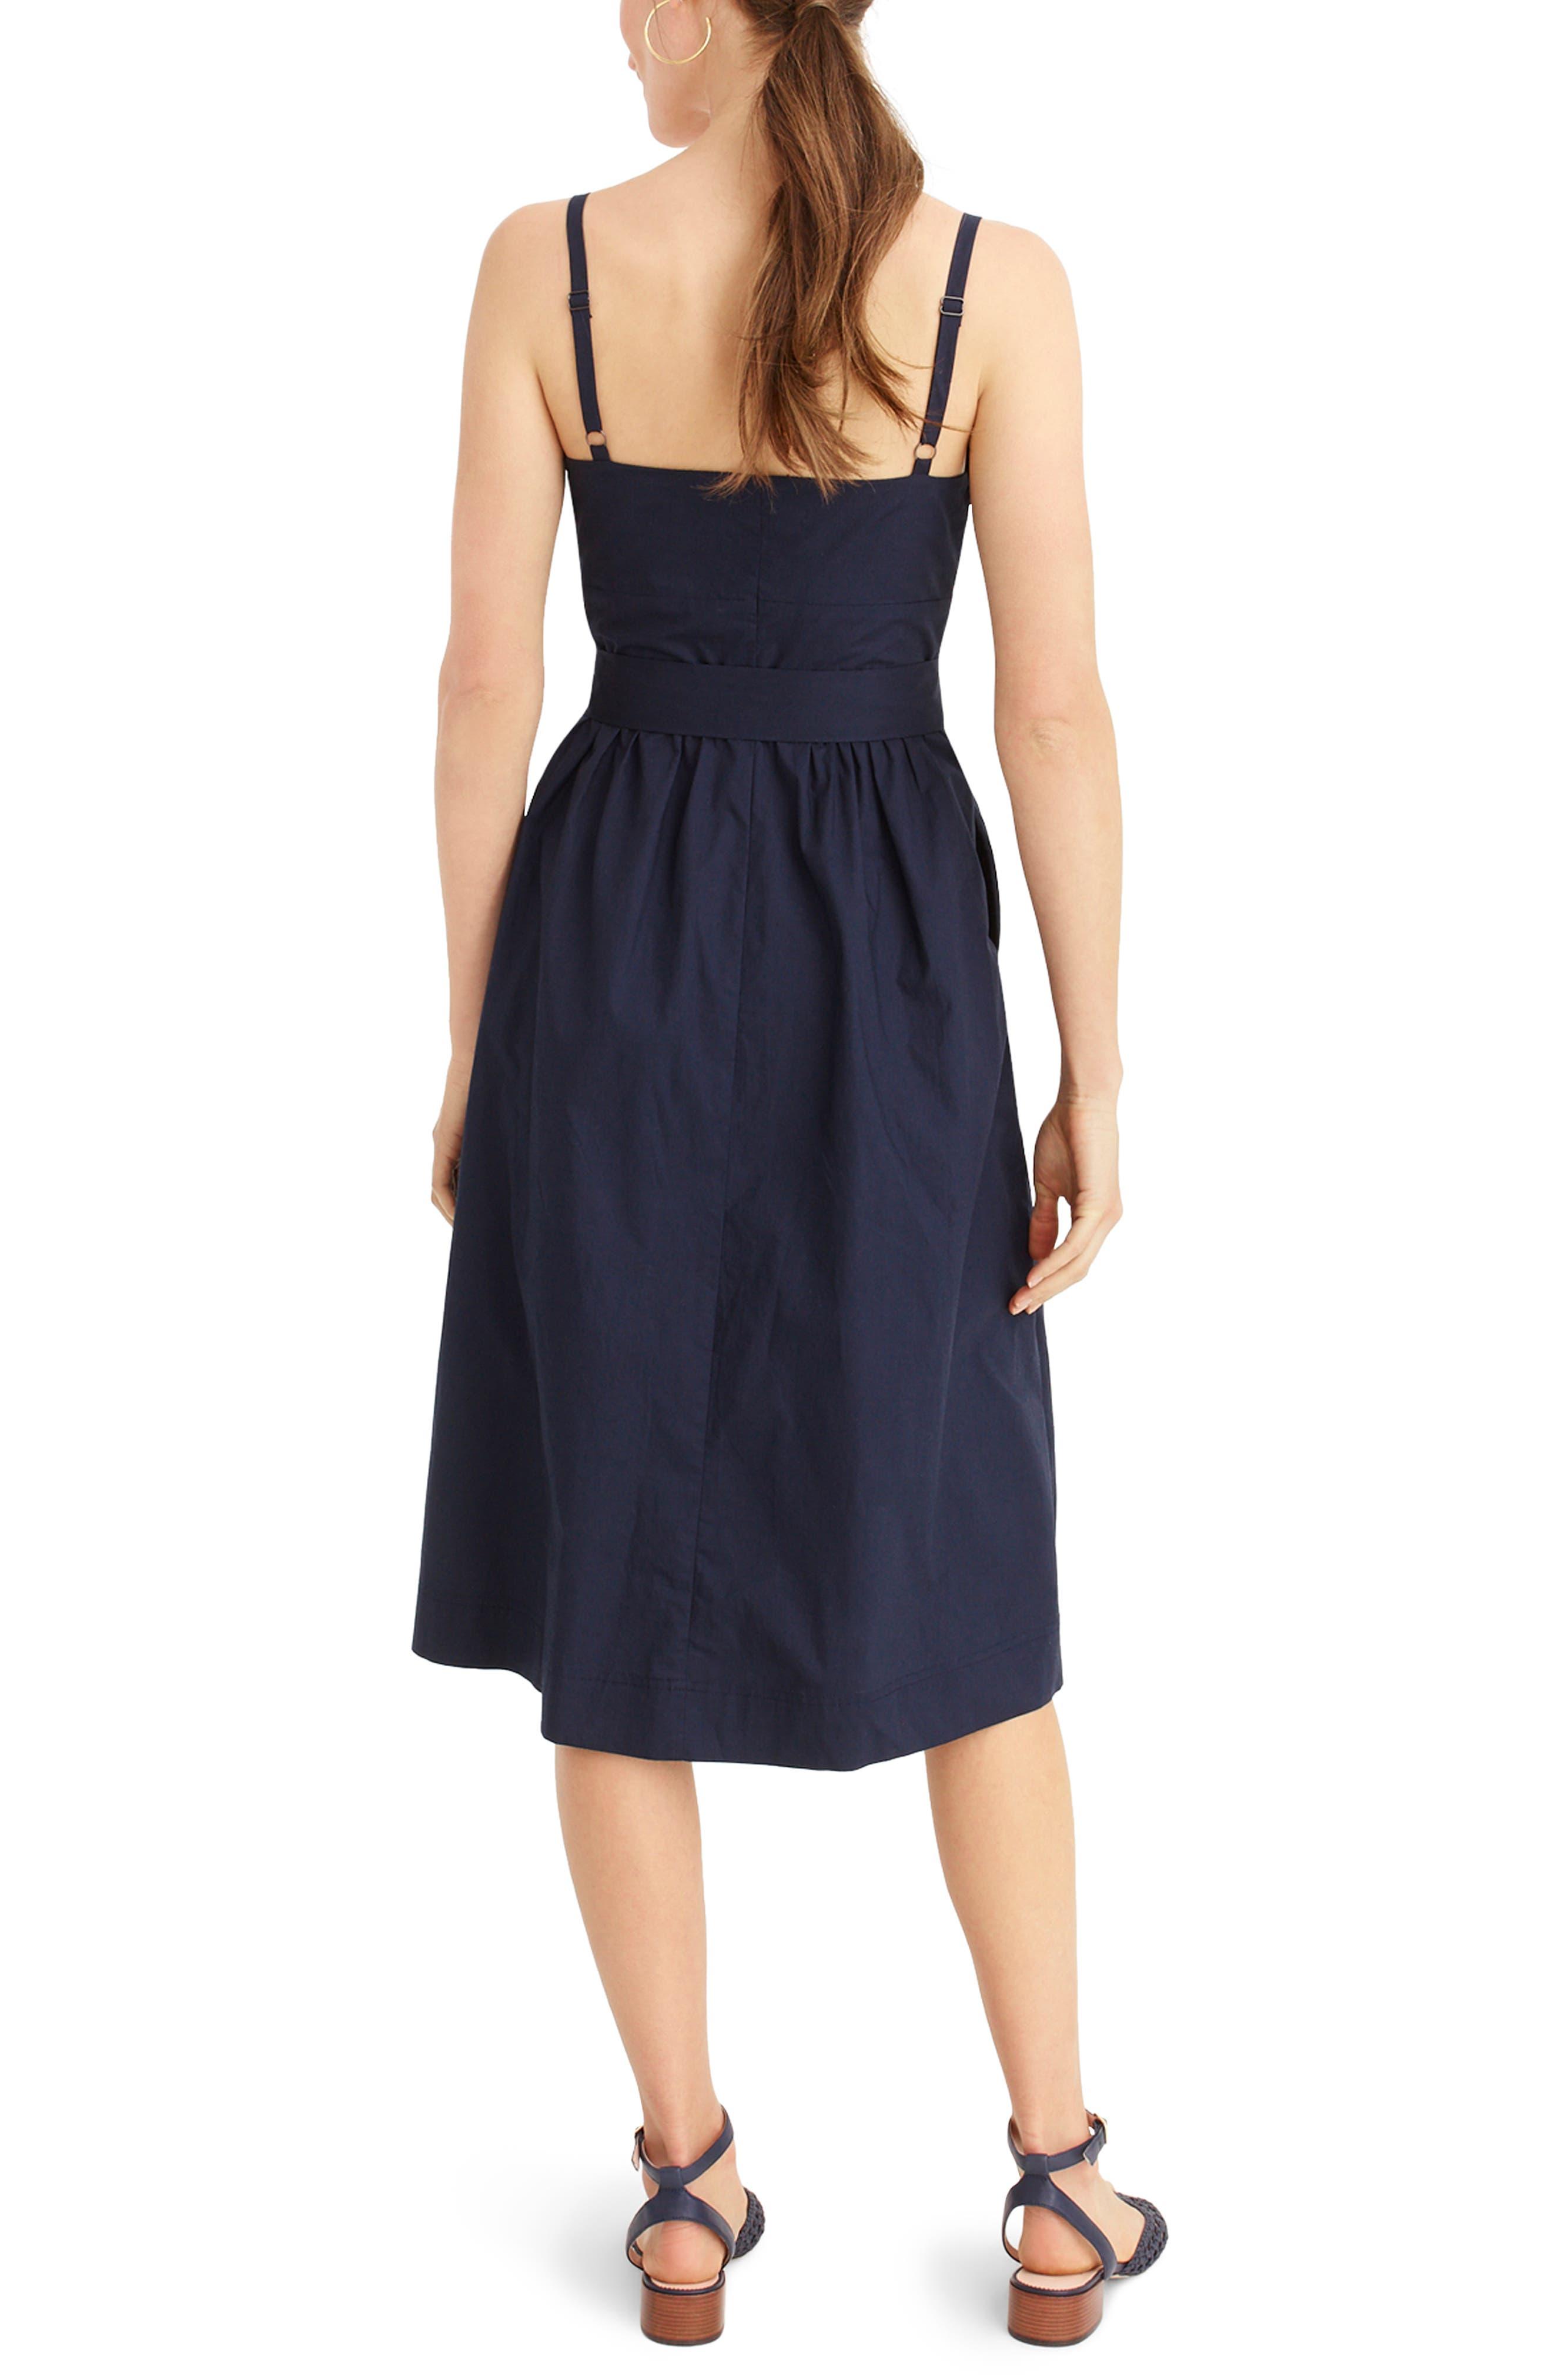 bbbc95be39b220 Women's J.Crew Dresses   Nordstrom